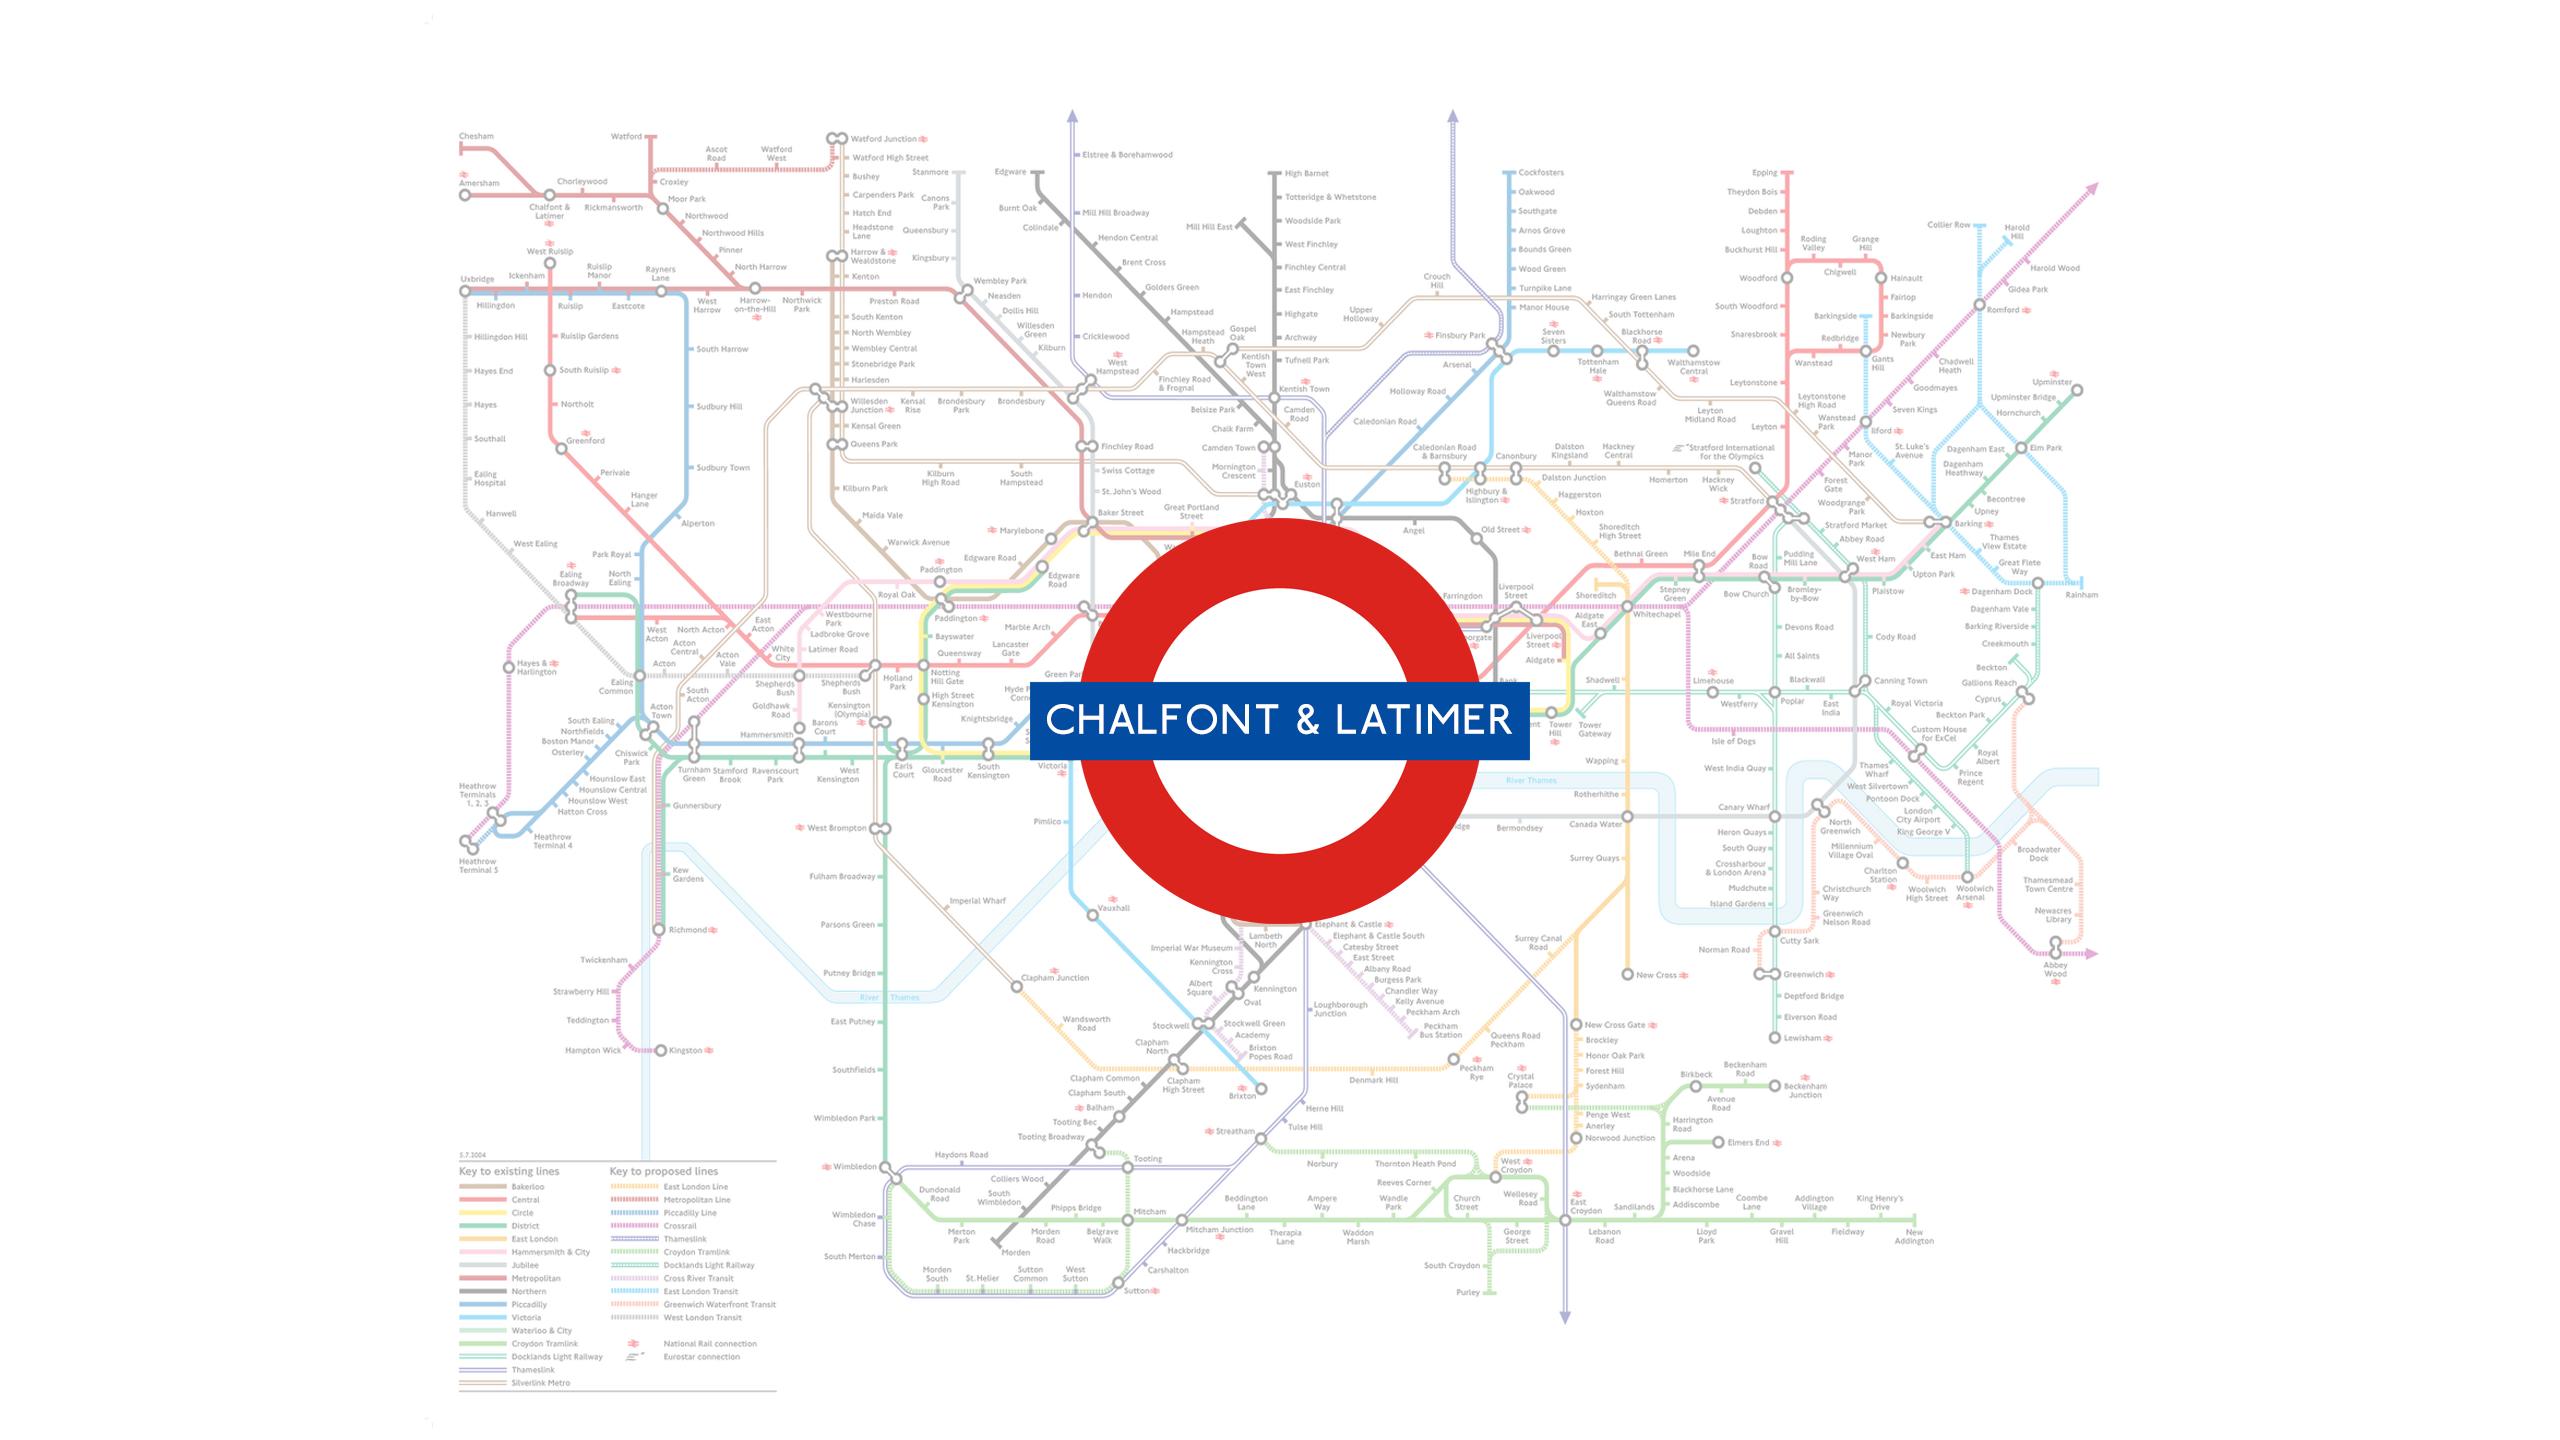 Chalfont & Latimer (Map)